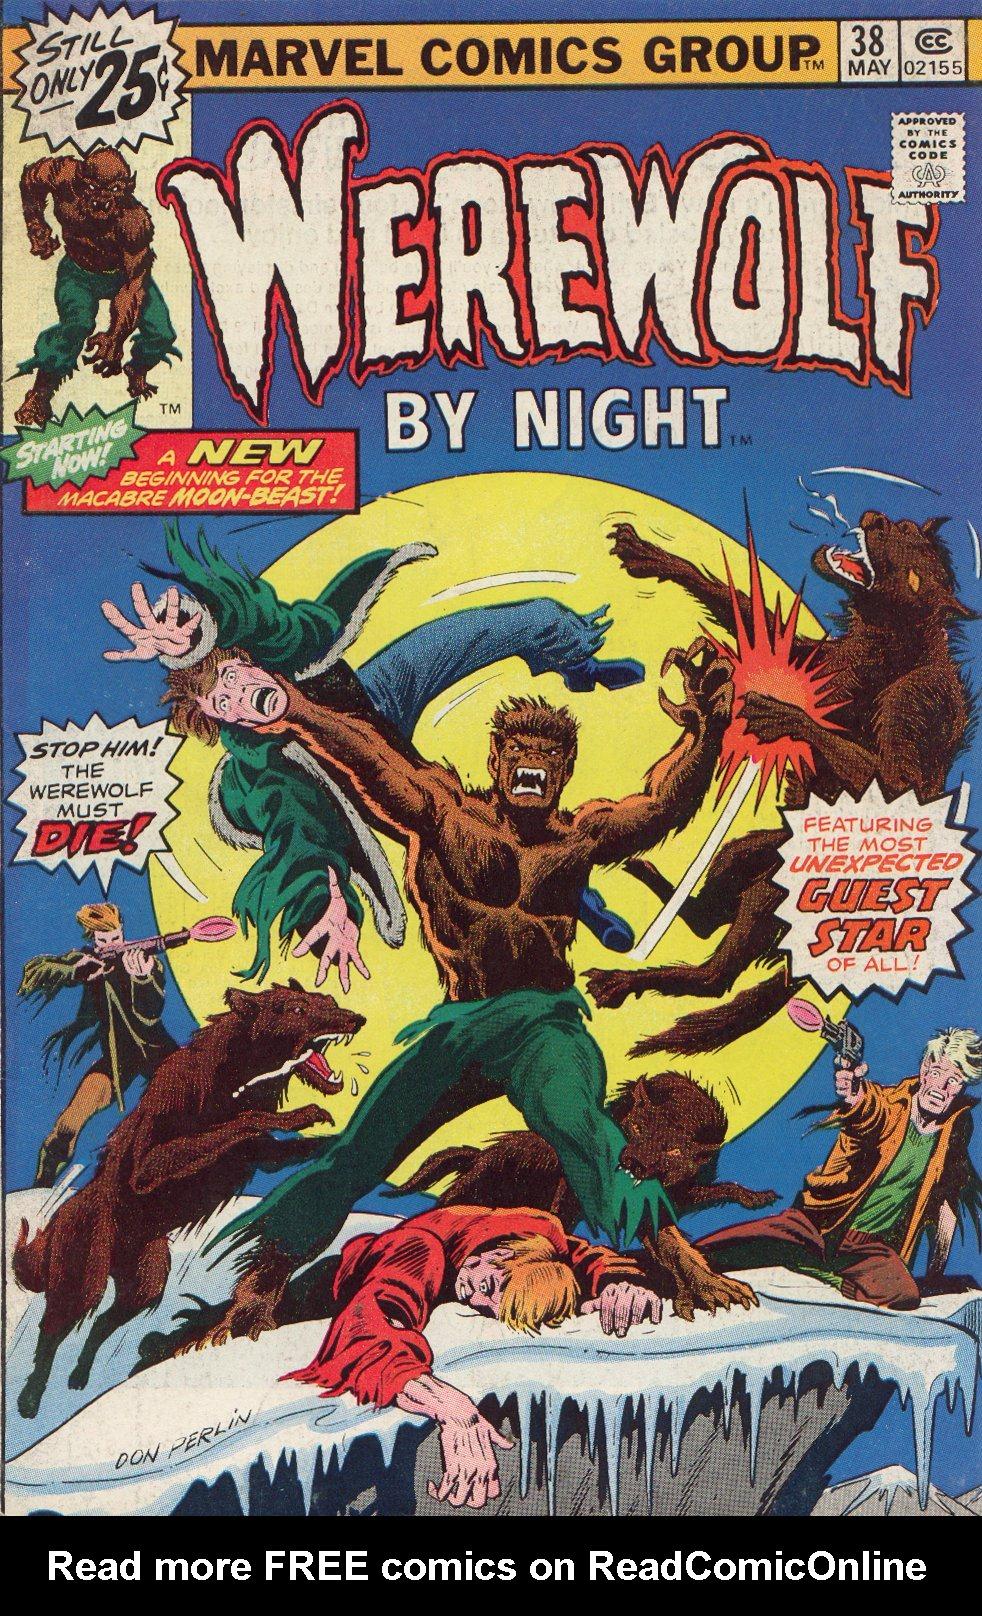 Werewolf by Night (1972) issue 38 - Page 1